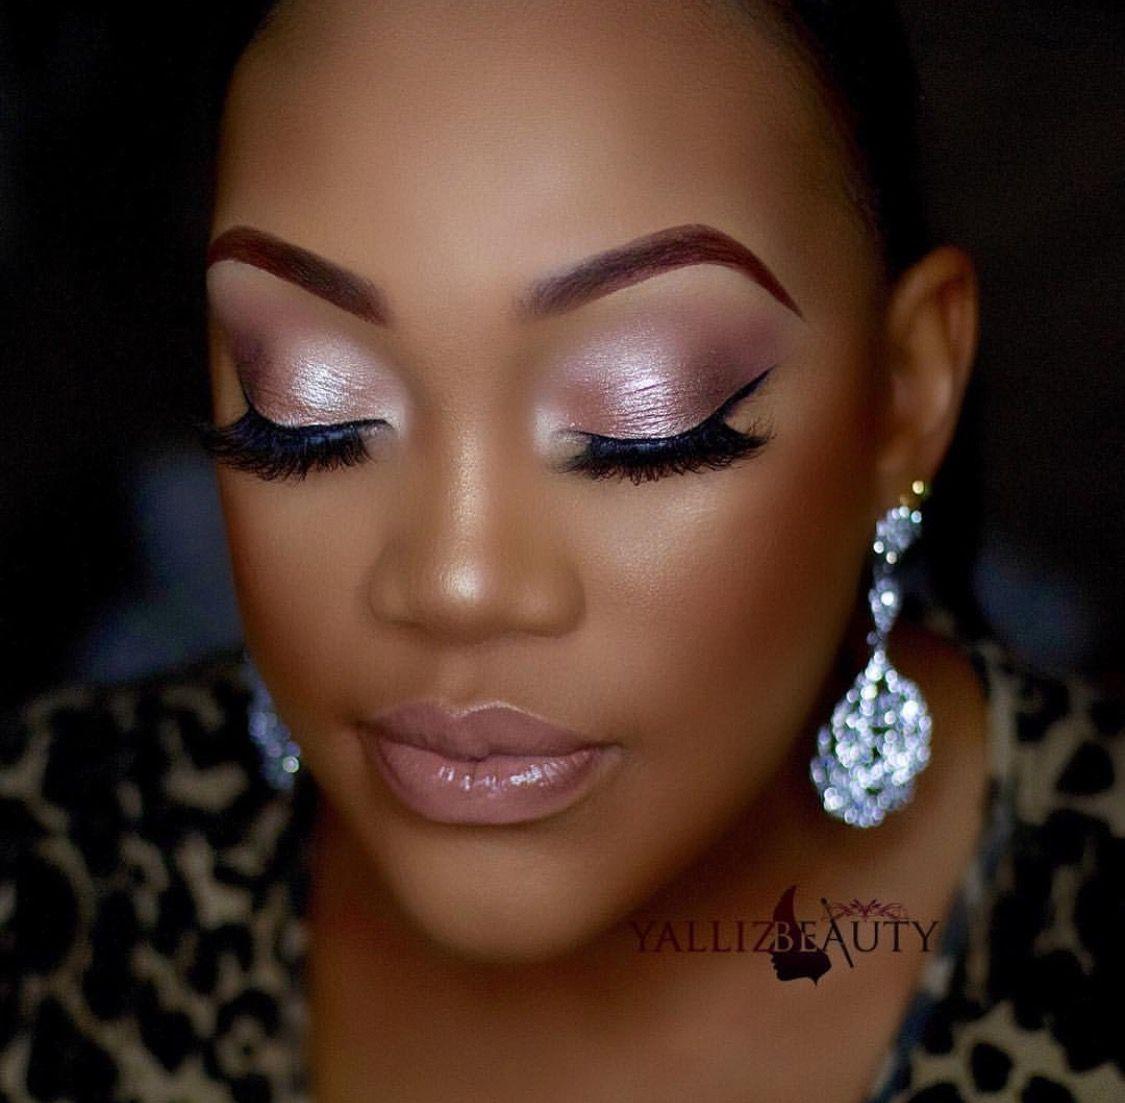 Makeup for black women Makeup for black women, Soft glam